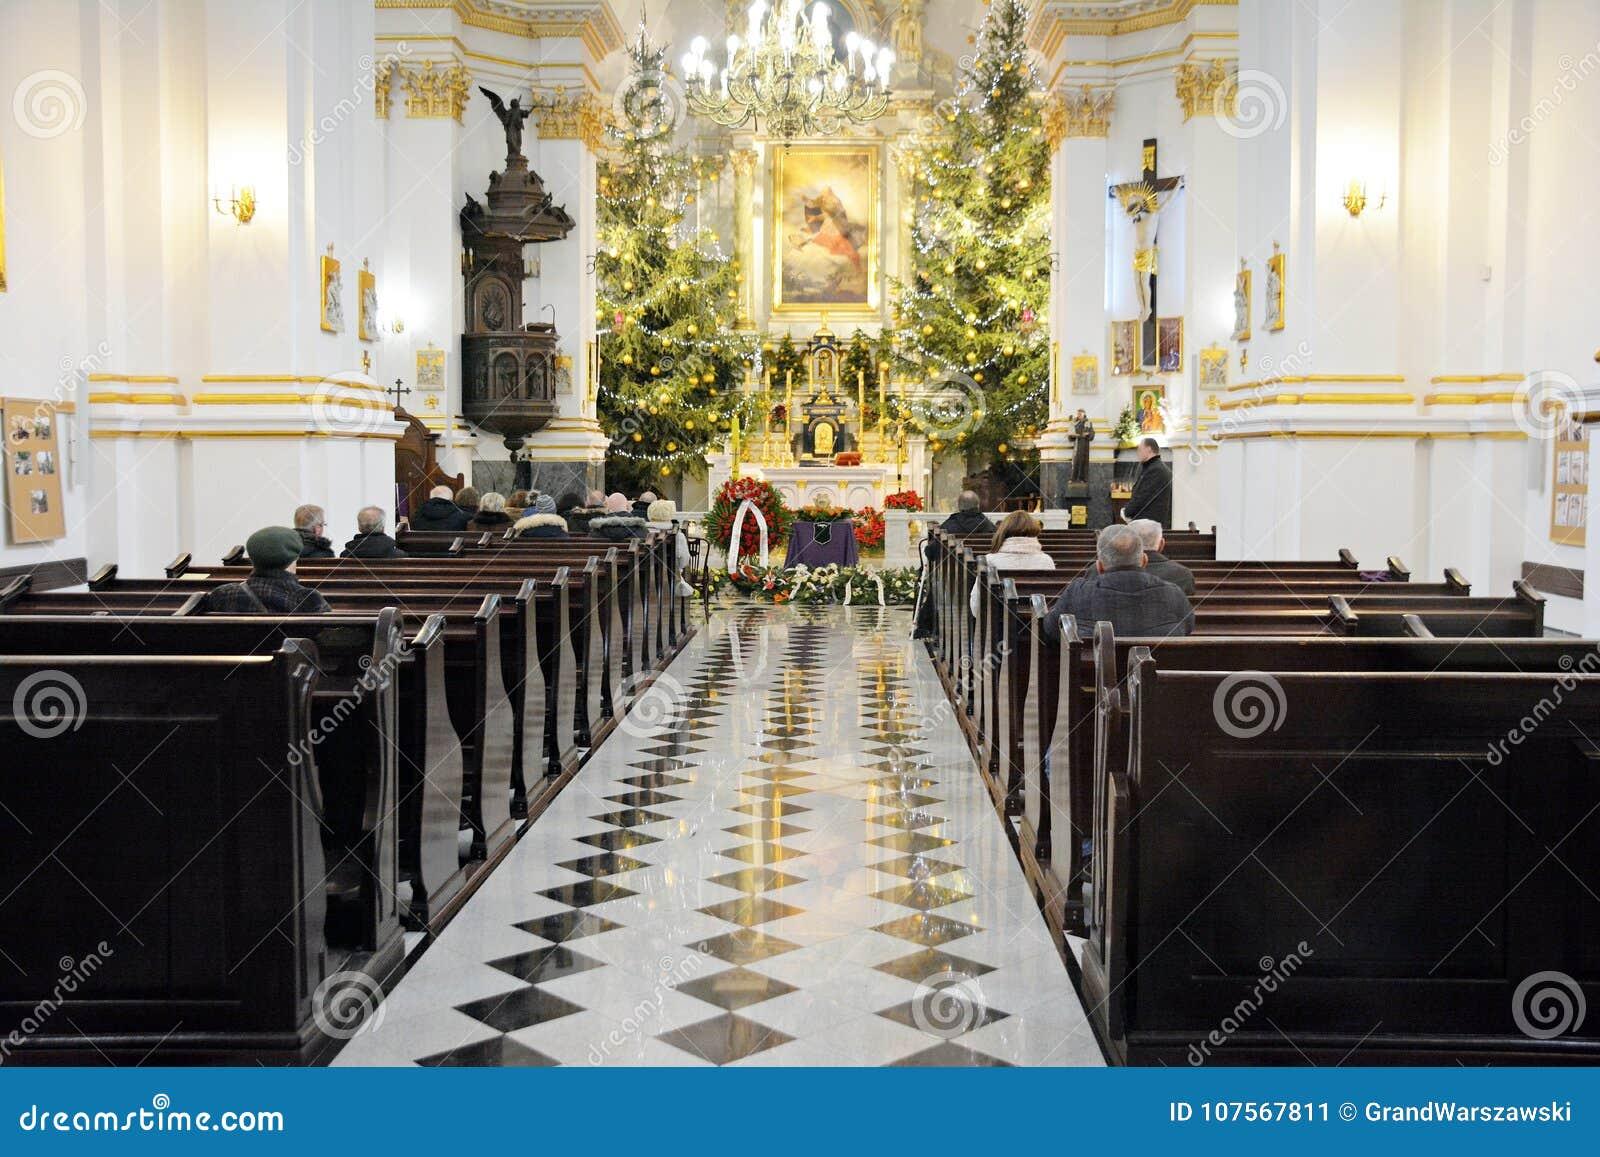 Cerimonia funerea in chiesa